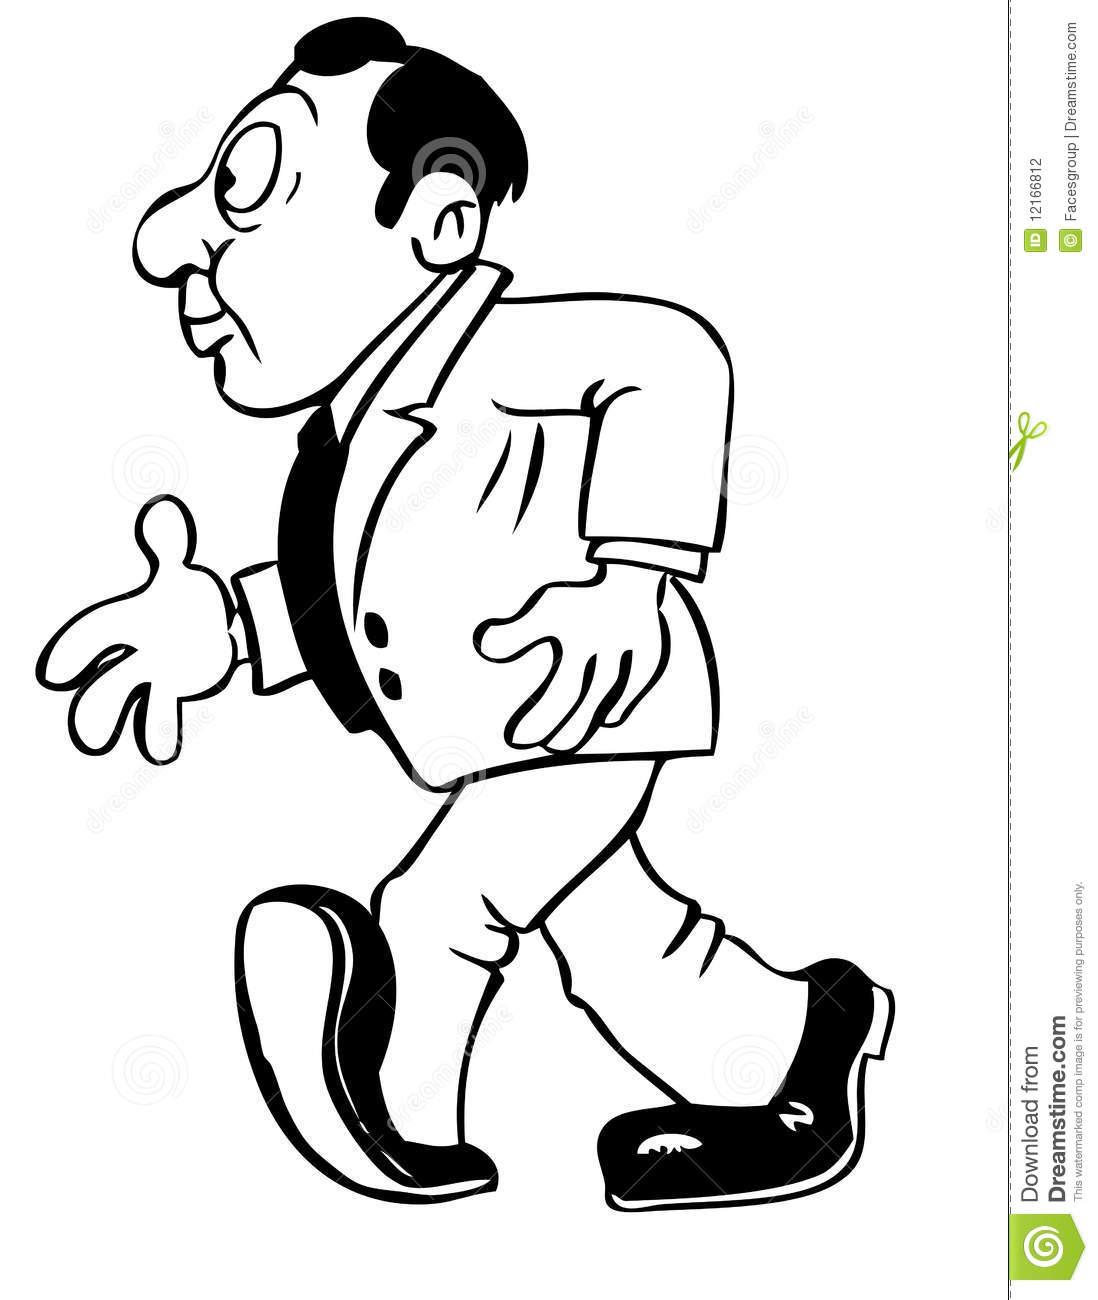 1098x1300 Drawing Cartoon Man Cartoon Drawing Of A Man Stock Vector. Image